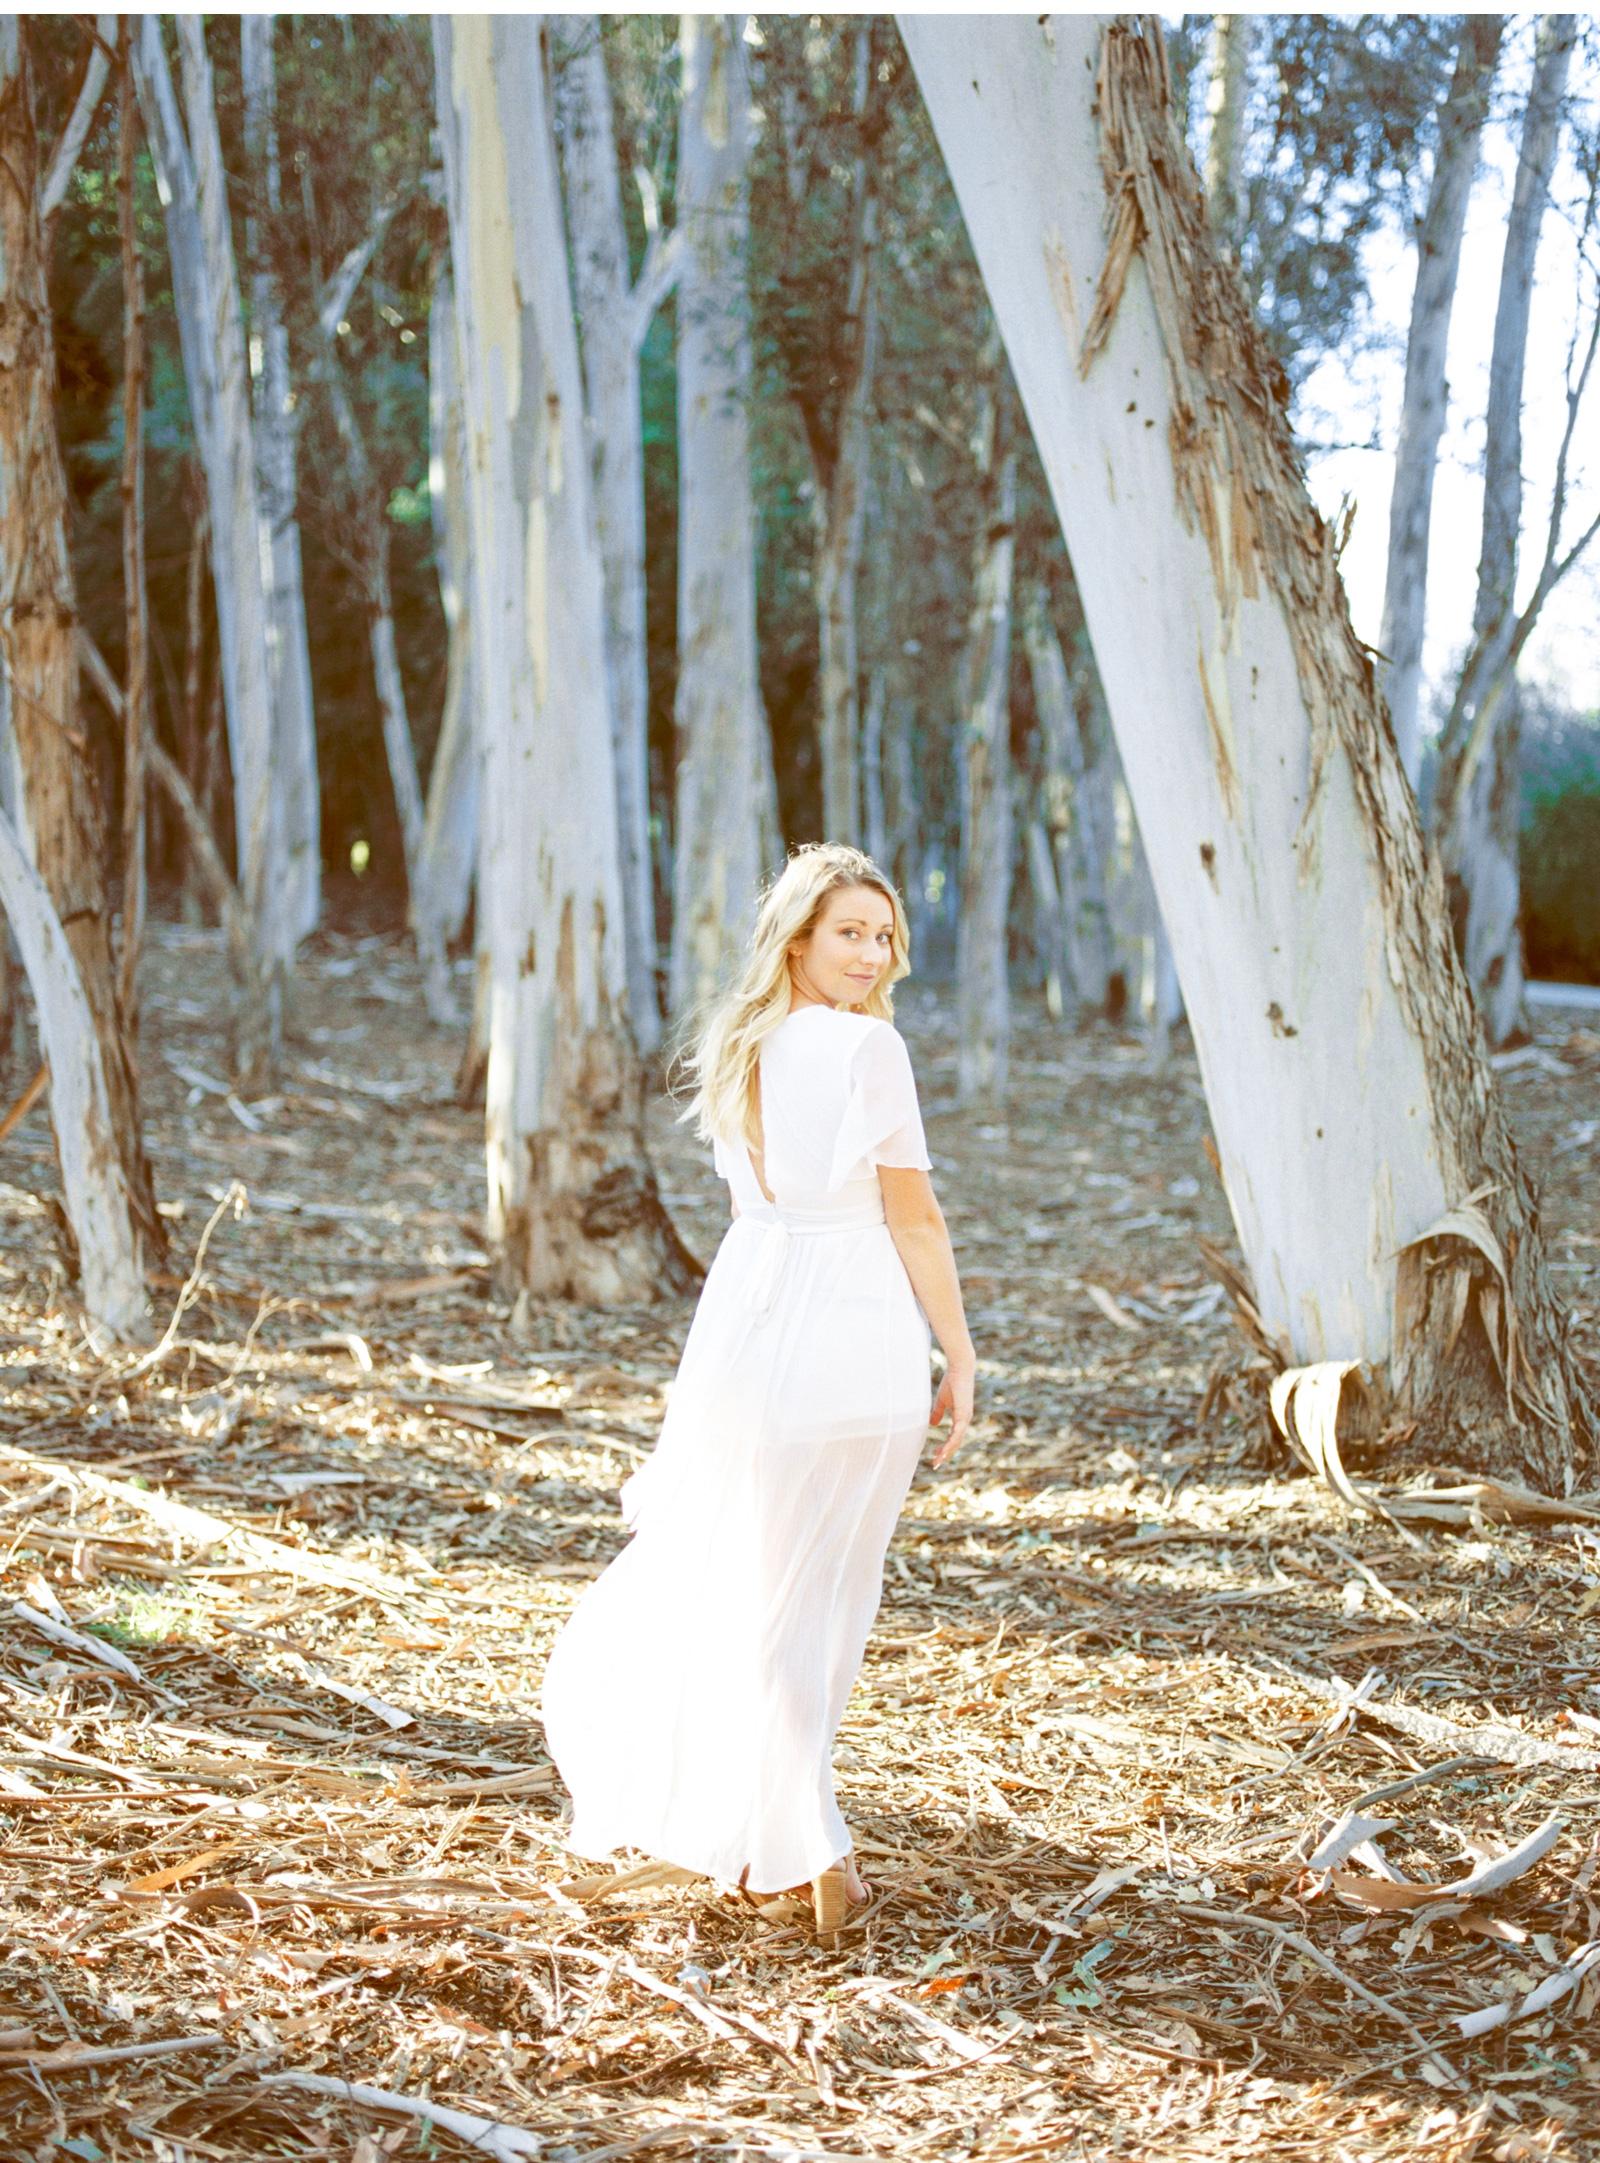 Malibu-Wedding-Natalie-Schutt-Photography-Style-Me-Pretty_11.jpg